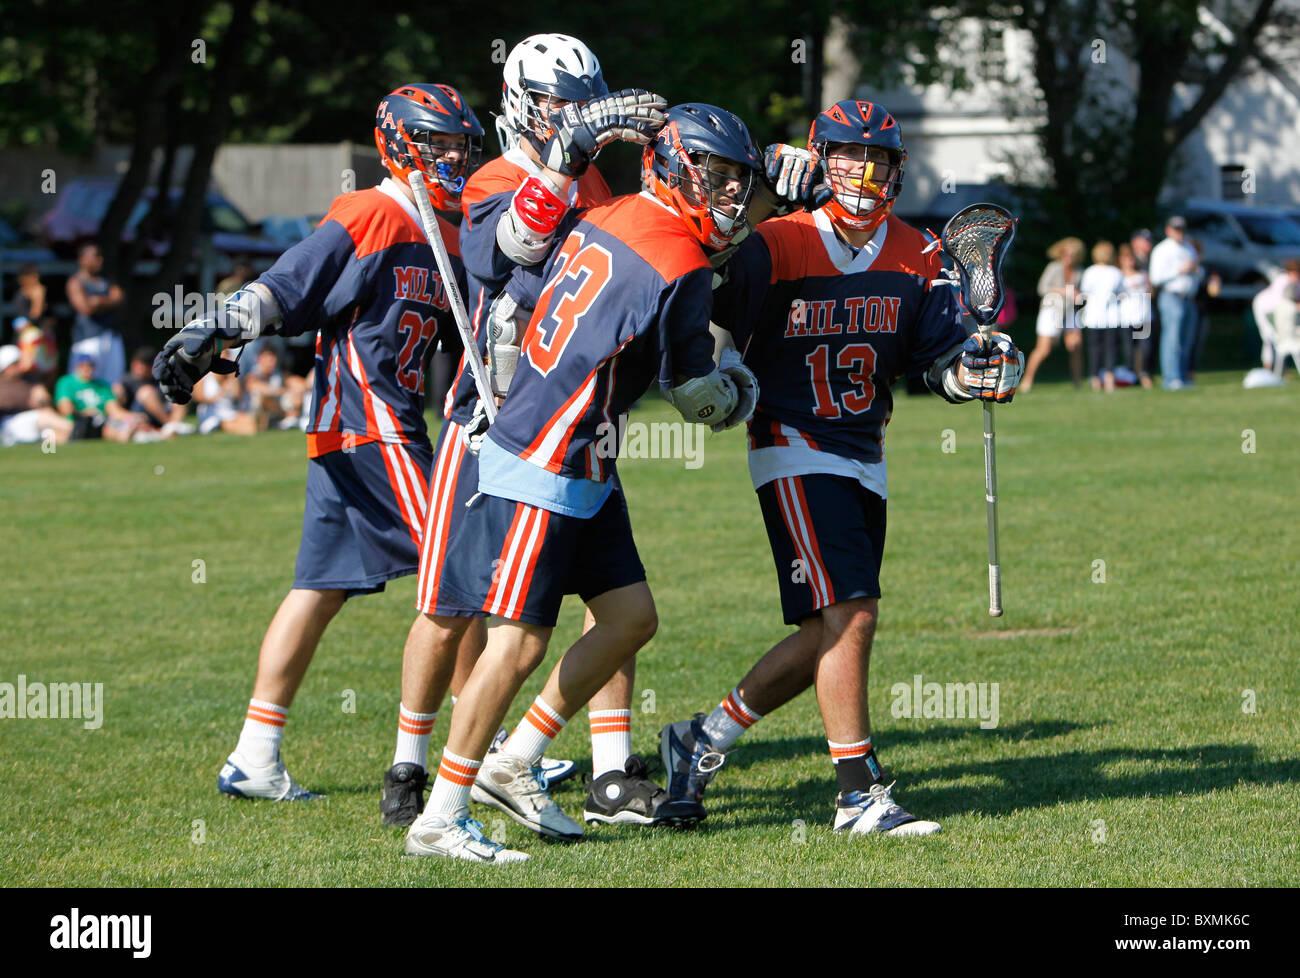 American high school lacrosse team celebrates after scoring - Stock Image